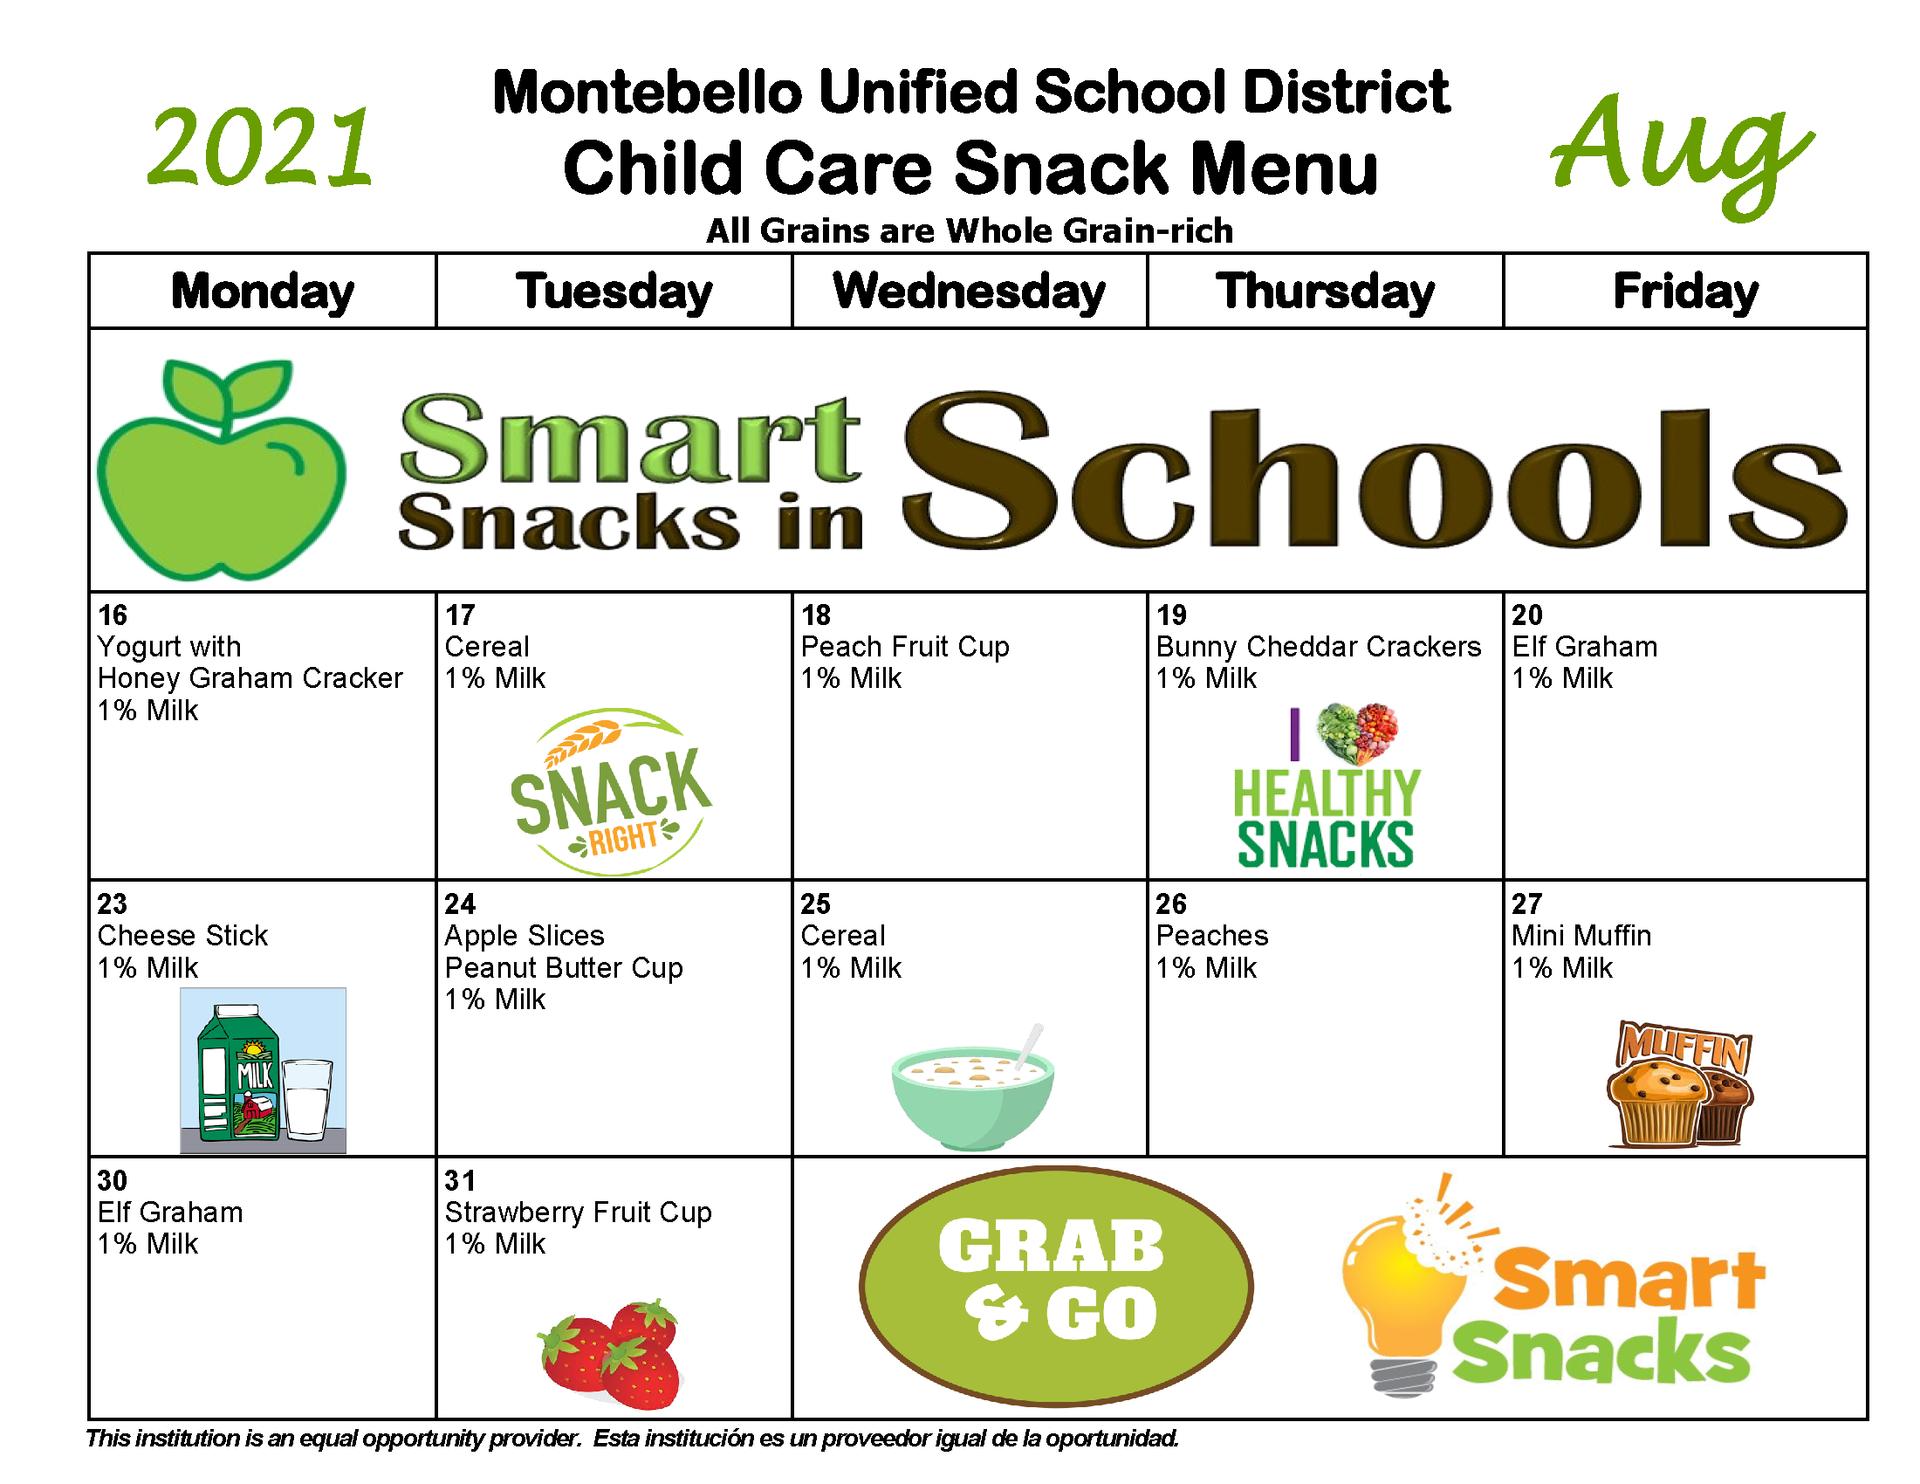 August Child Care Snack Menu